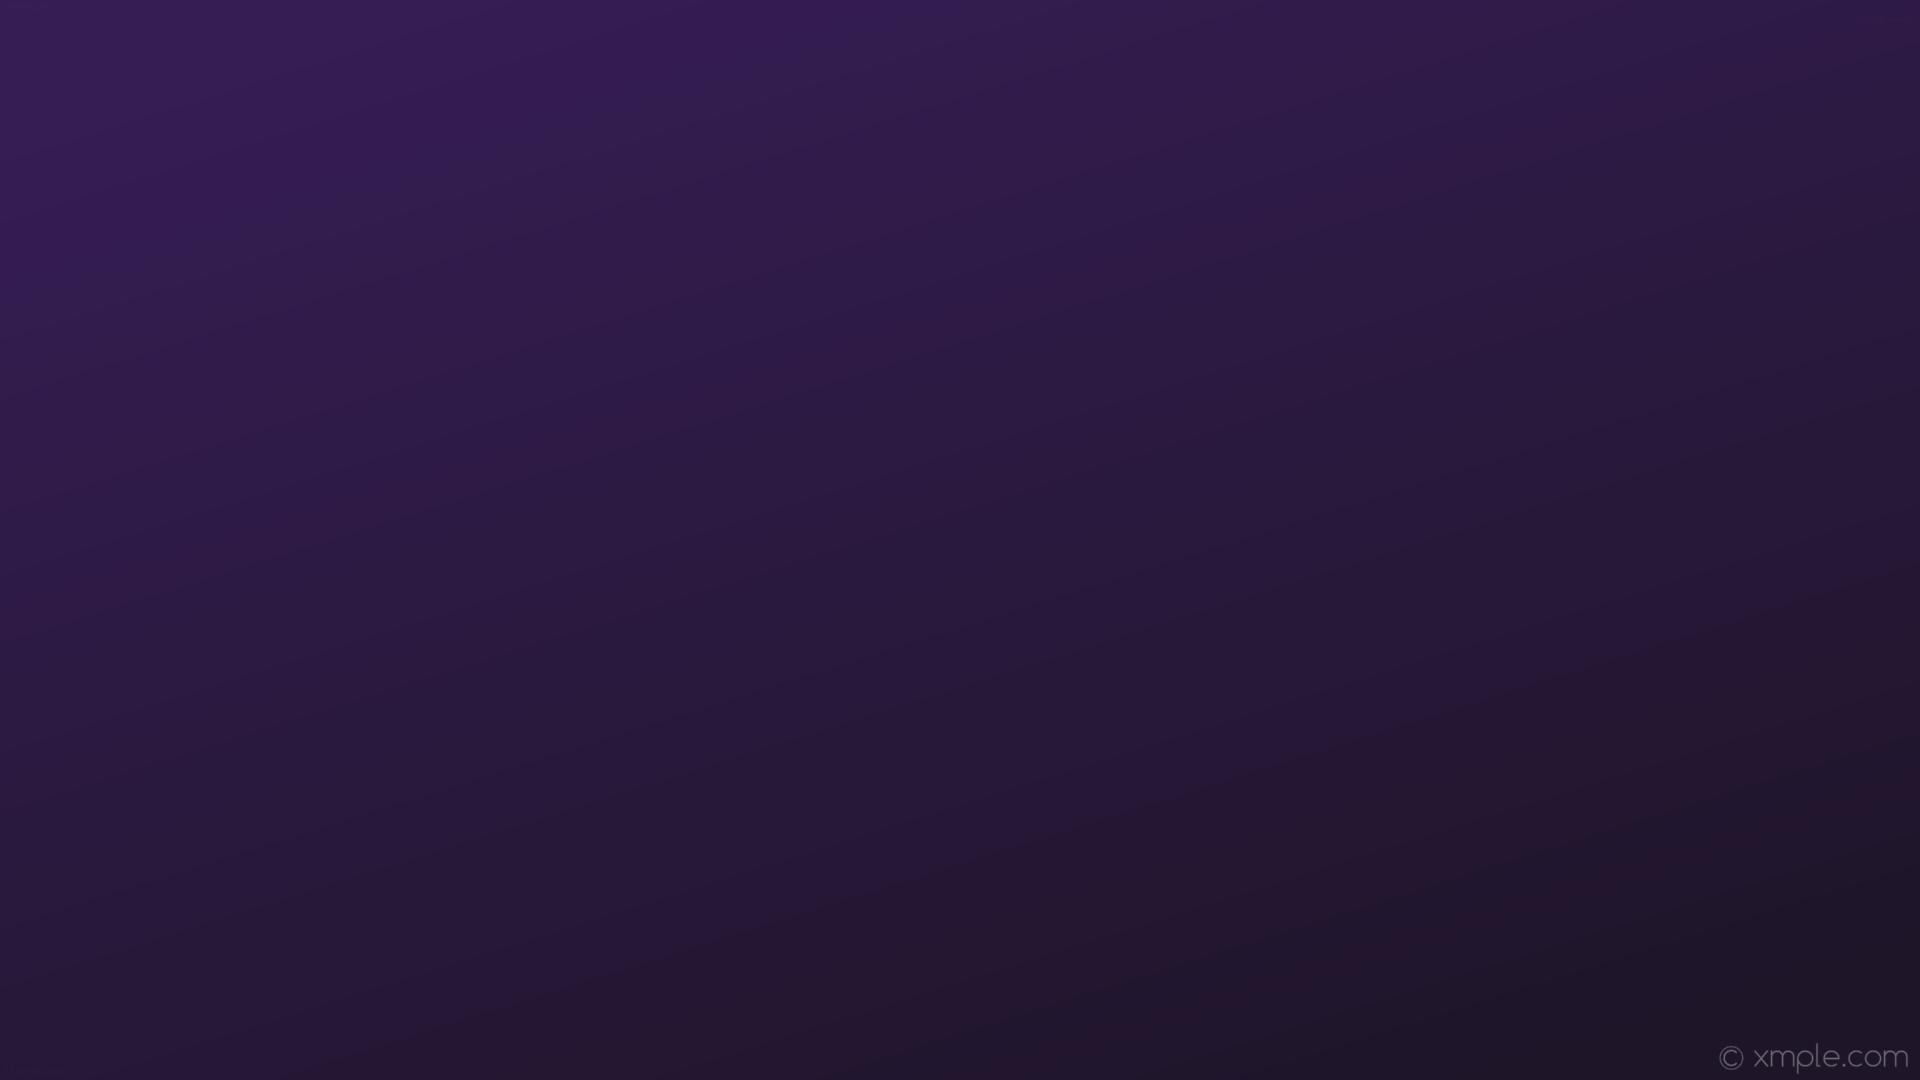 wallpaper gradient violet linear dark violet #361d54 #1e1529 135°